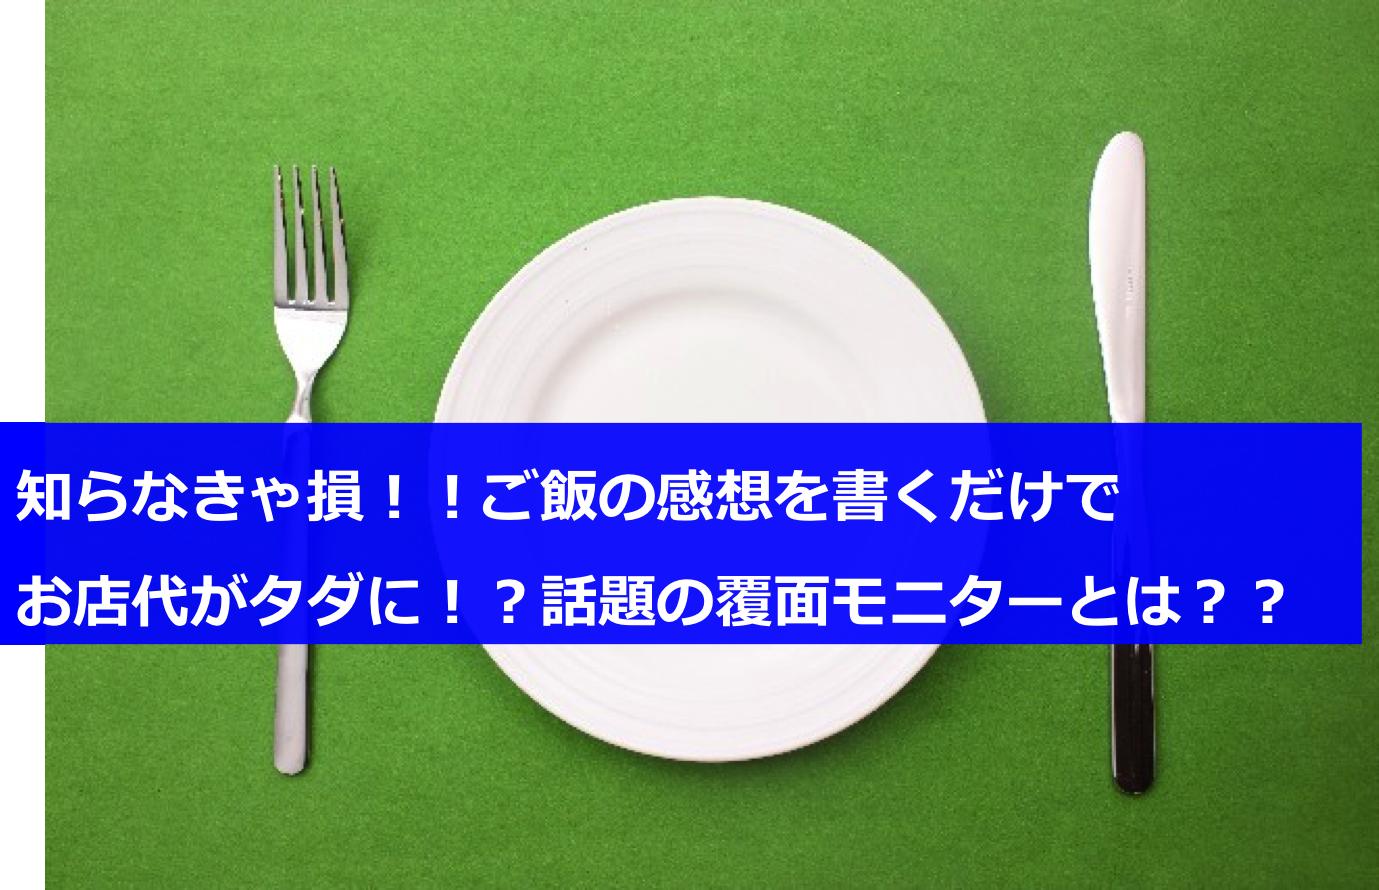 f:id:oooshiro:20140518095537j:plain